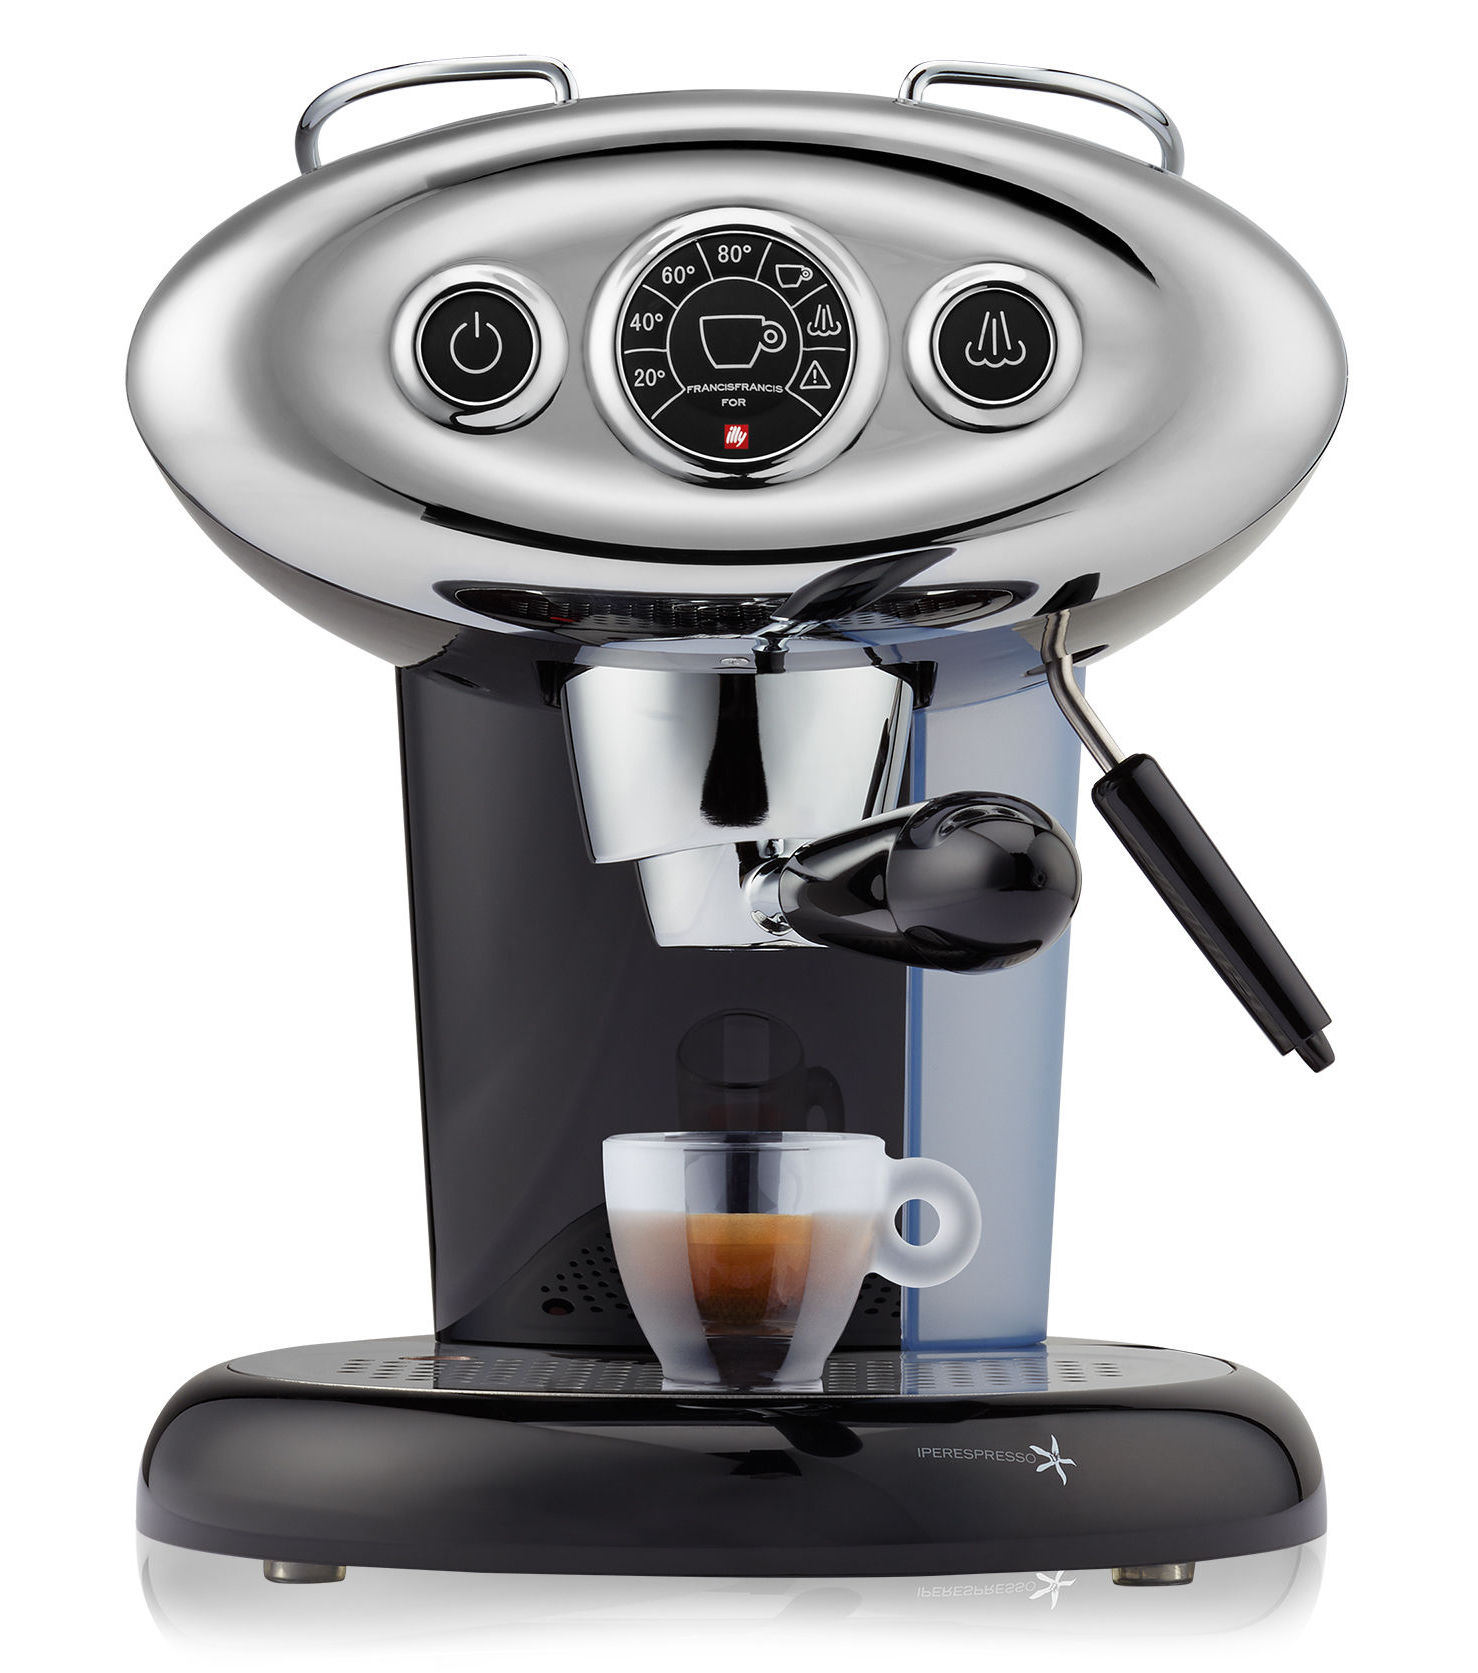 Boutique :: ILLY espresso & coffee machines :: Acheter X7.1 - Prix